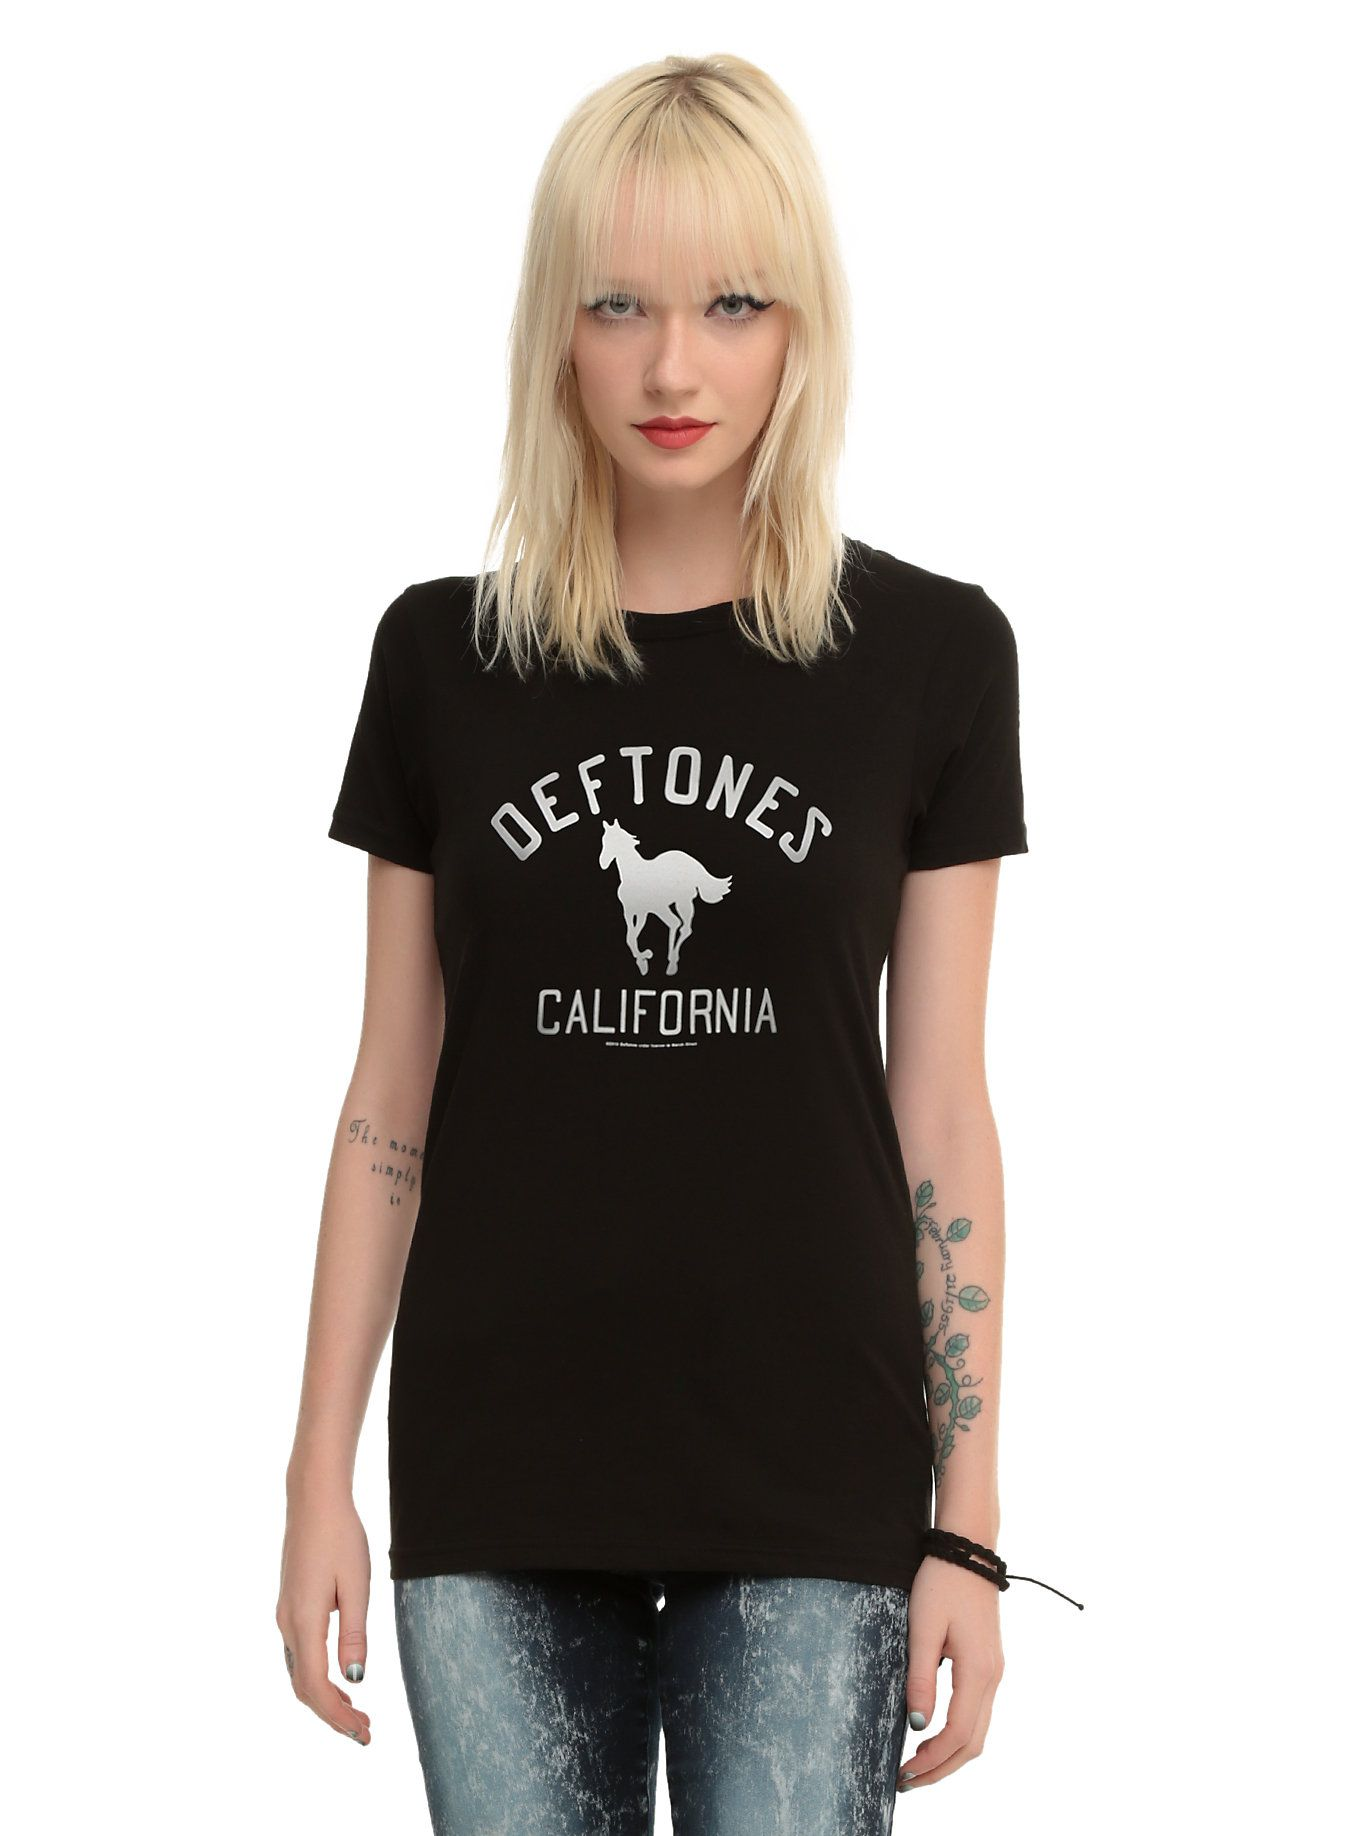 Deftones White Pony California Girls T Shirt Girls Tshirts Wonder Woman Shirt Womens Shirts [ 1836 x 1360 Pixel ]